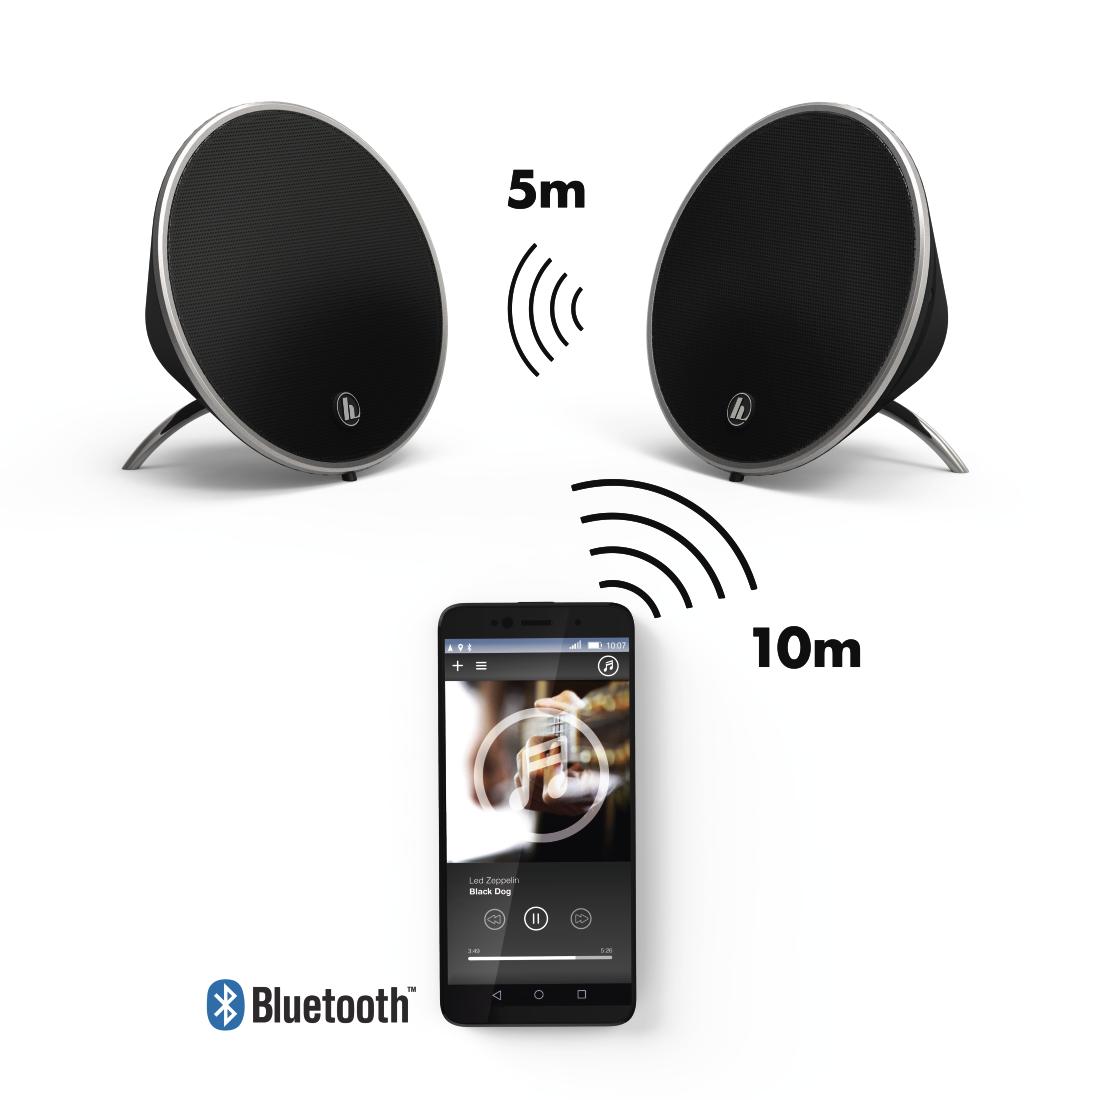 00173166 hama mobiles bluetooth lautsprecher set cones schwarz hama de. Black Bedroom Furniture Sets. Home Design Ideas